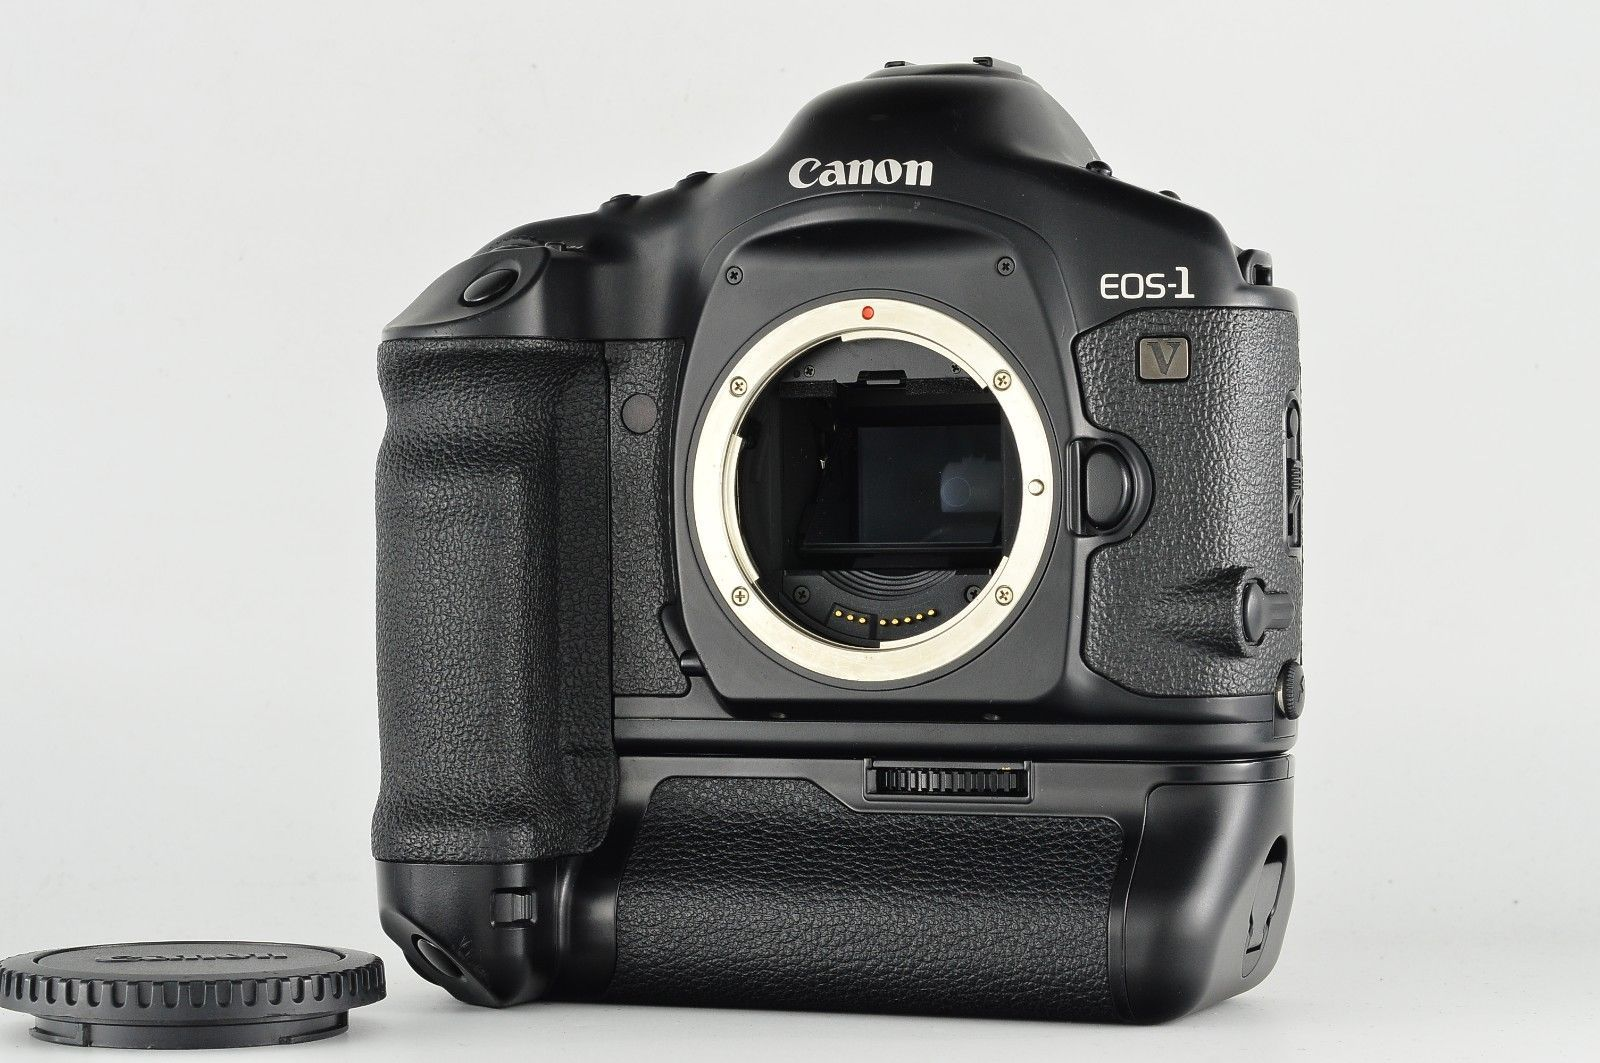 exc canon eos 1v hs 35mm slr film camera body pb e2 from japan rh pinterest com iv 4010 hs manual